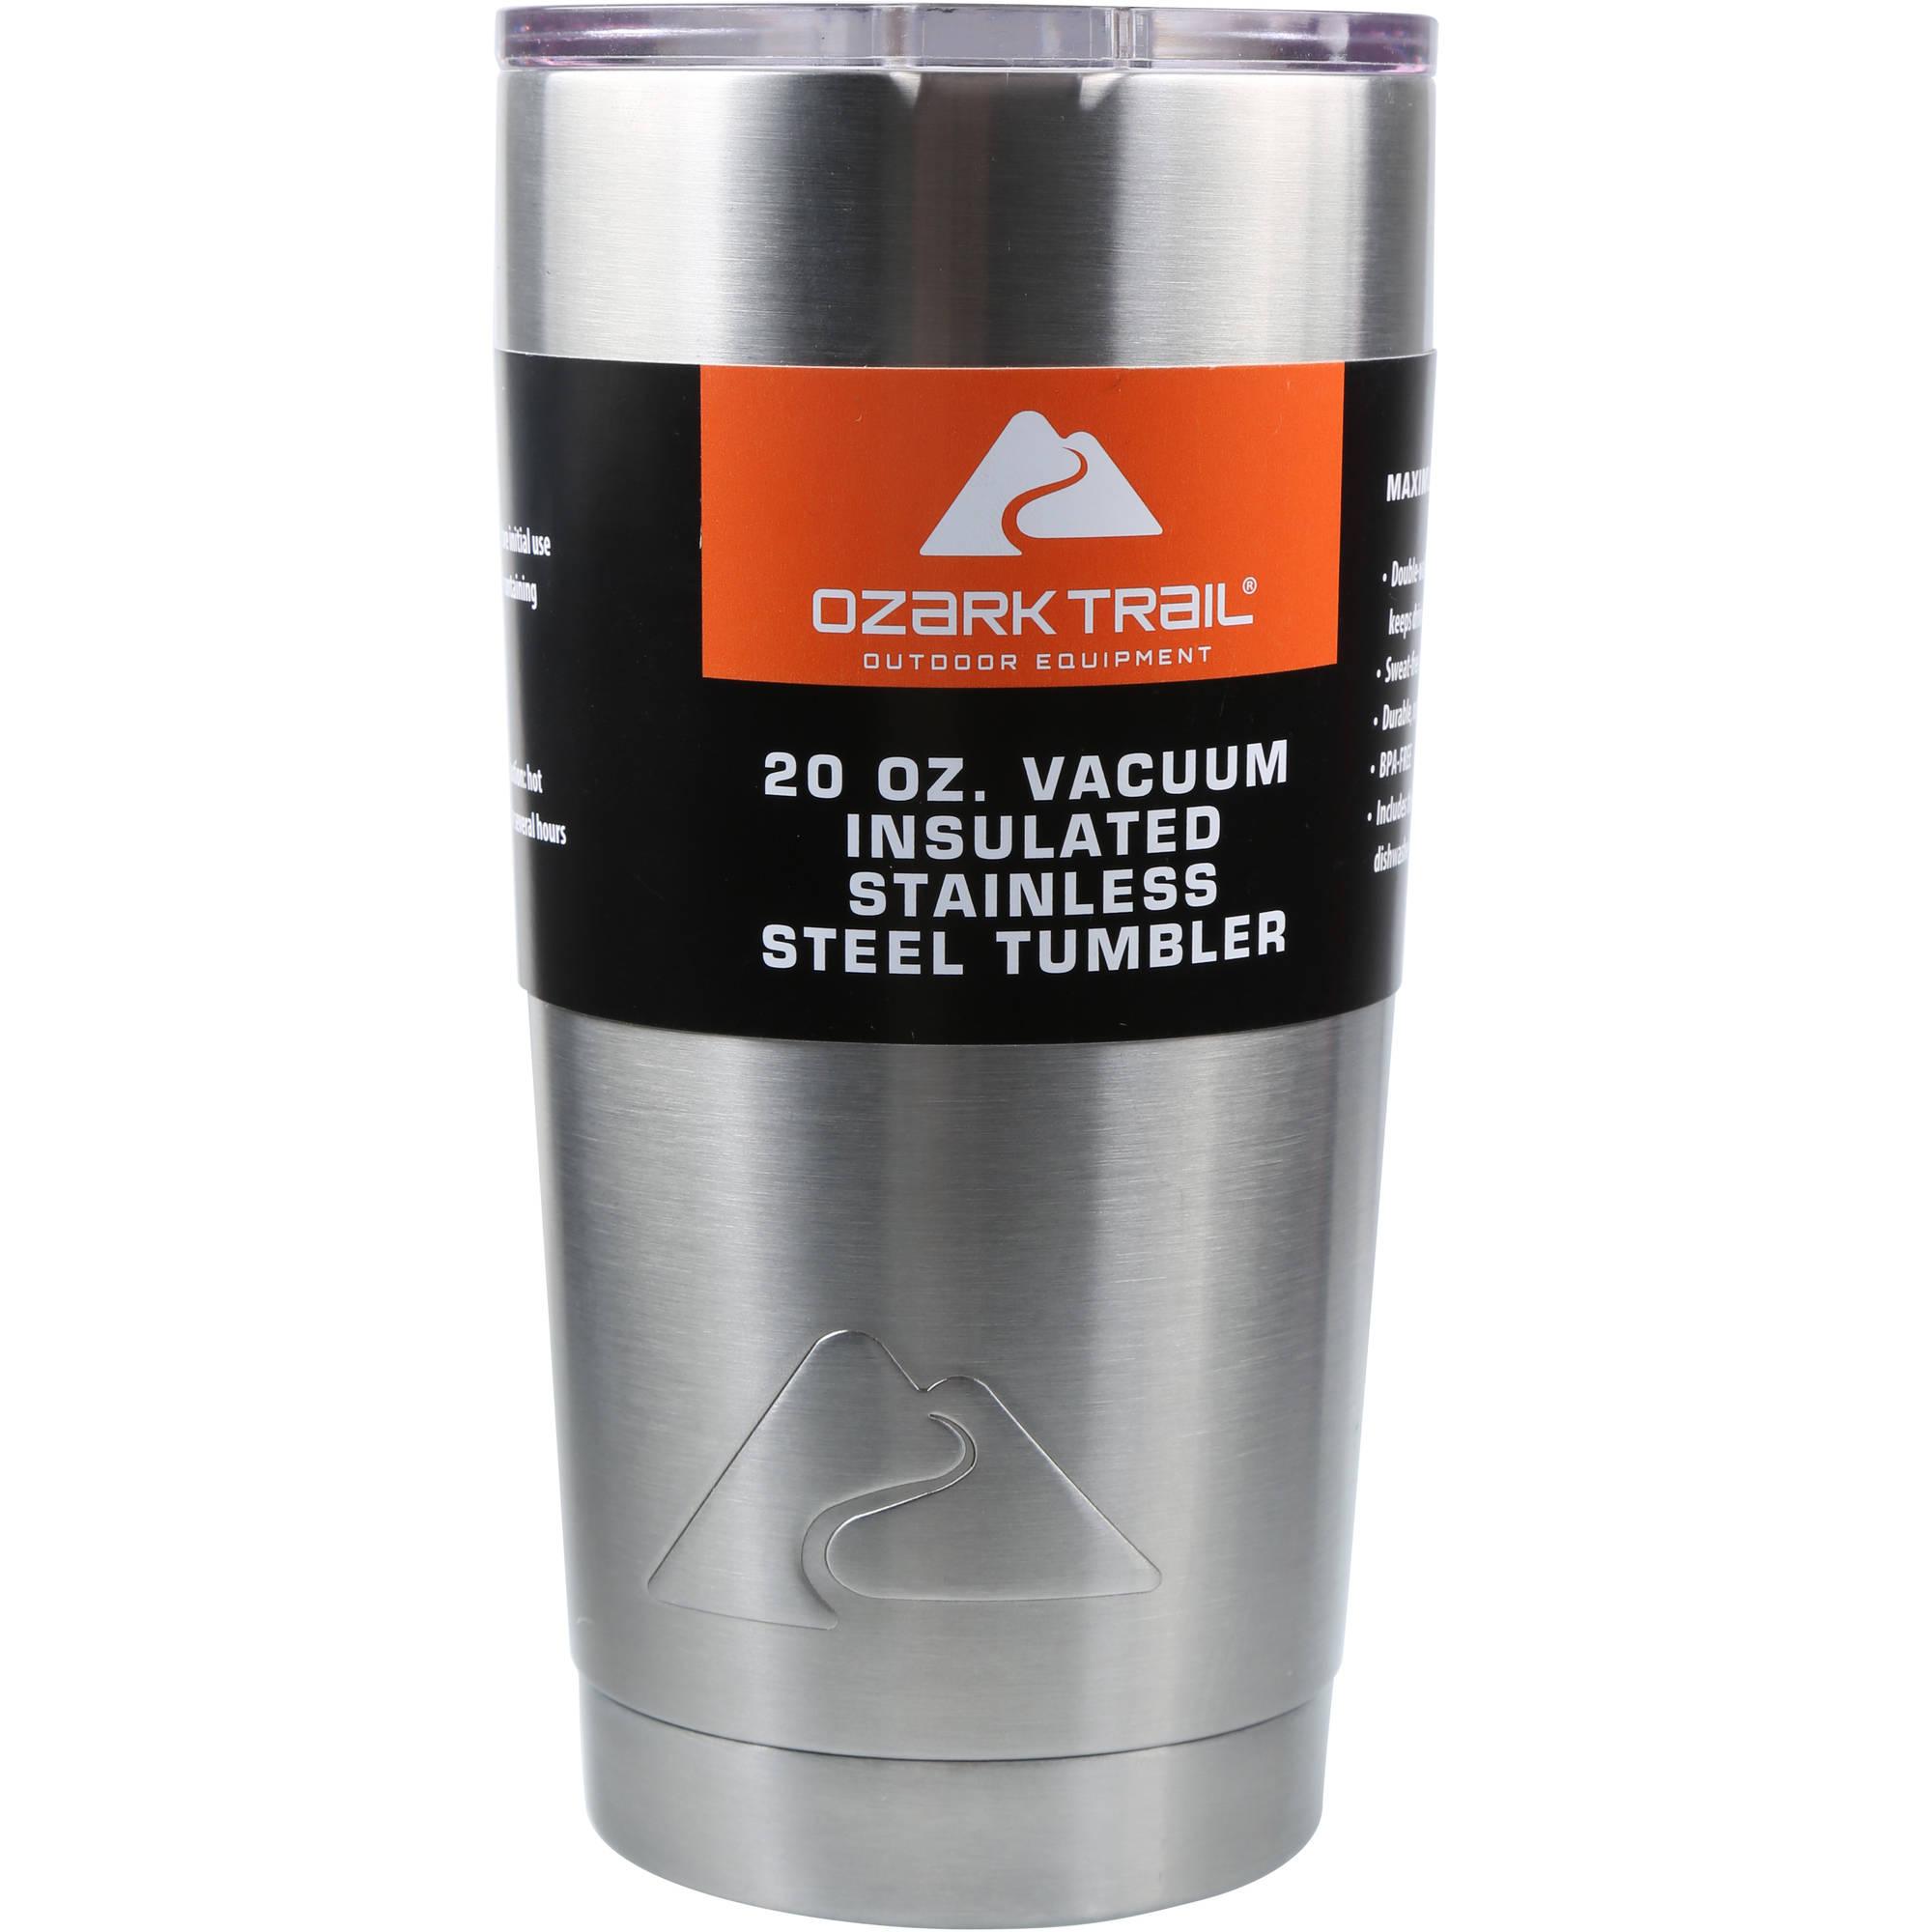 Insulated Steel Tumbler